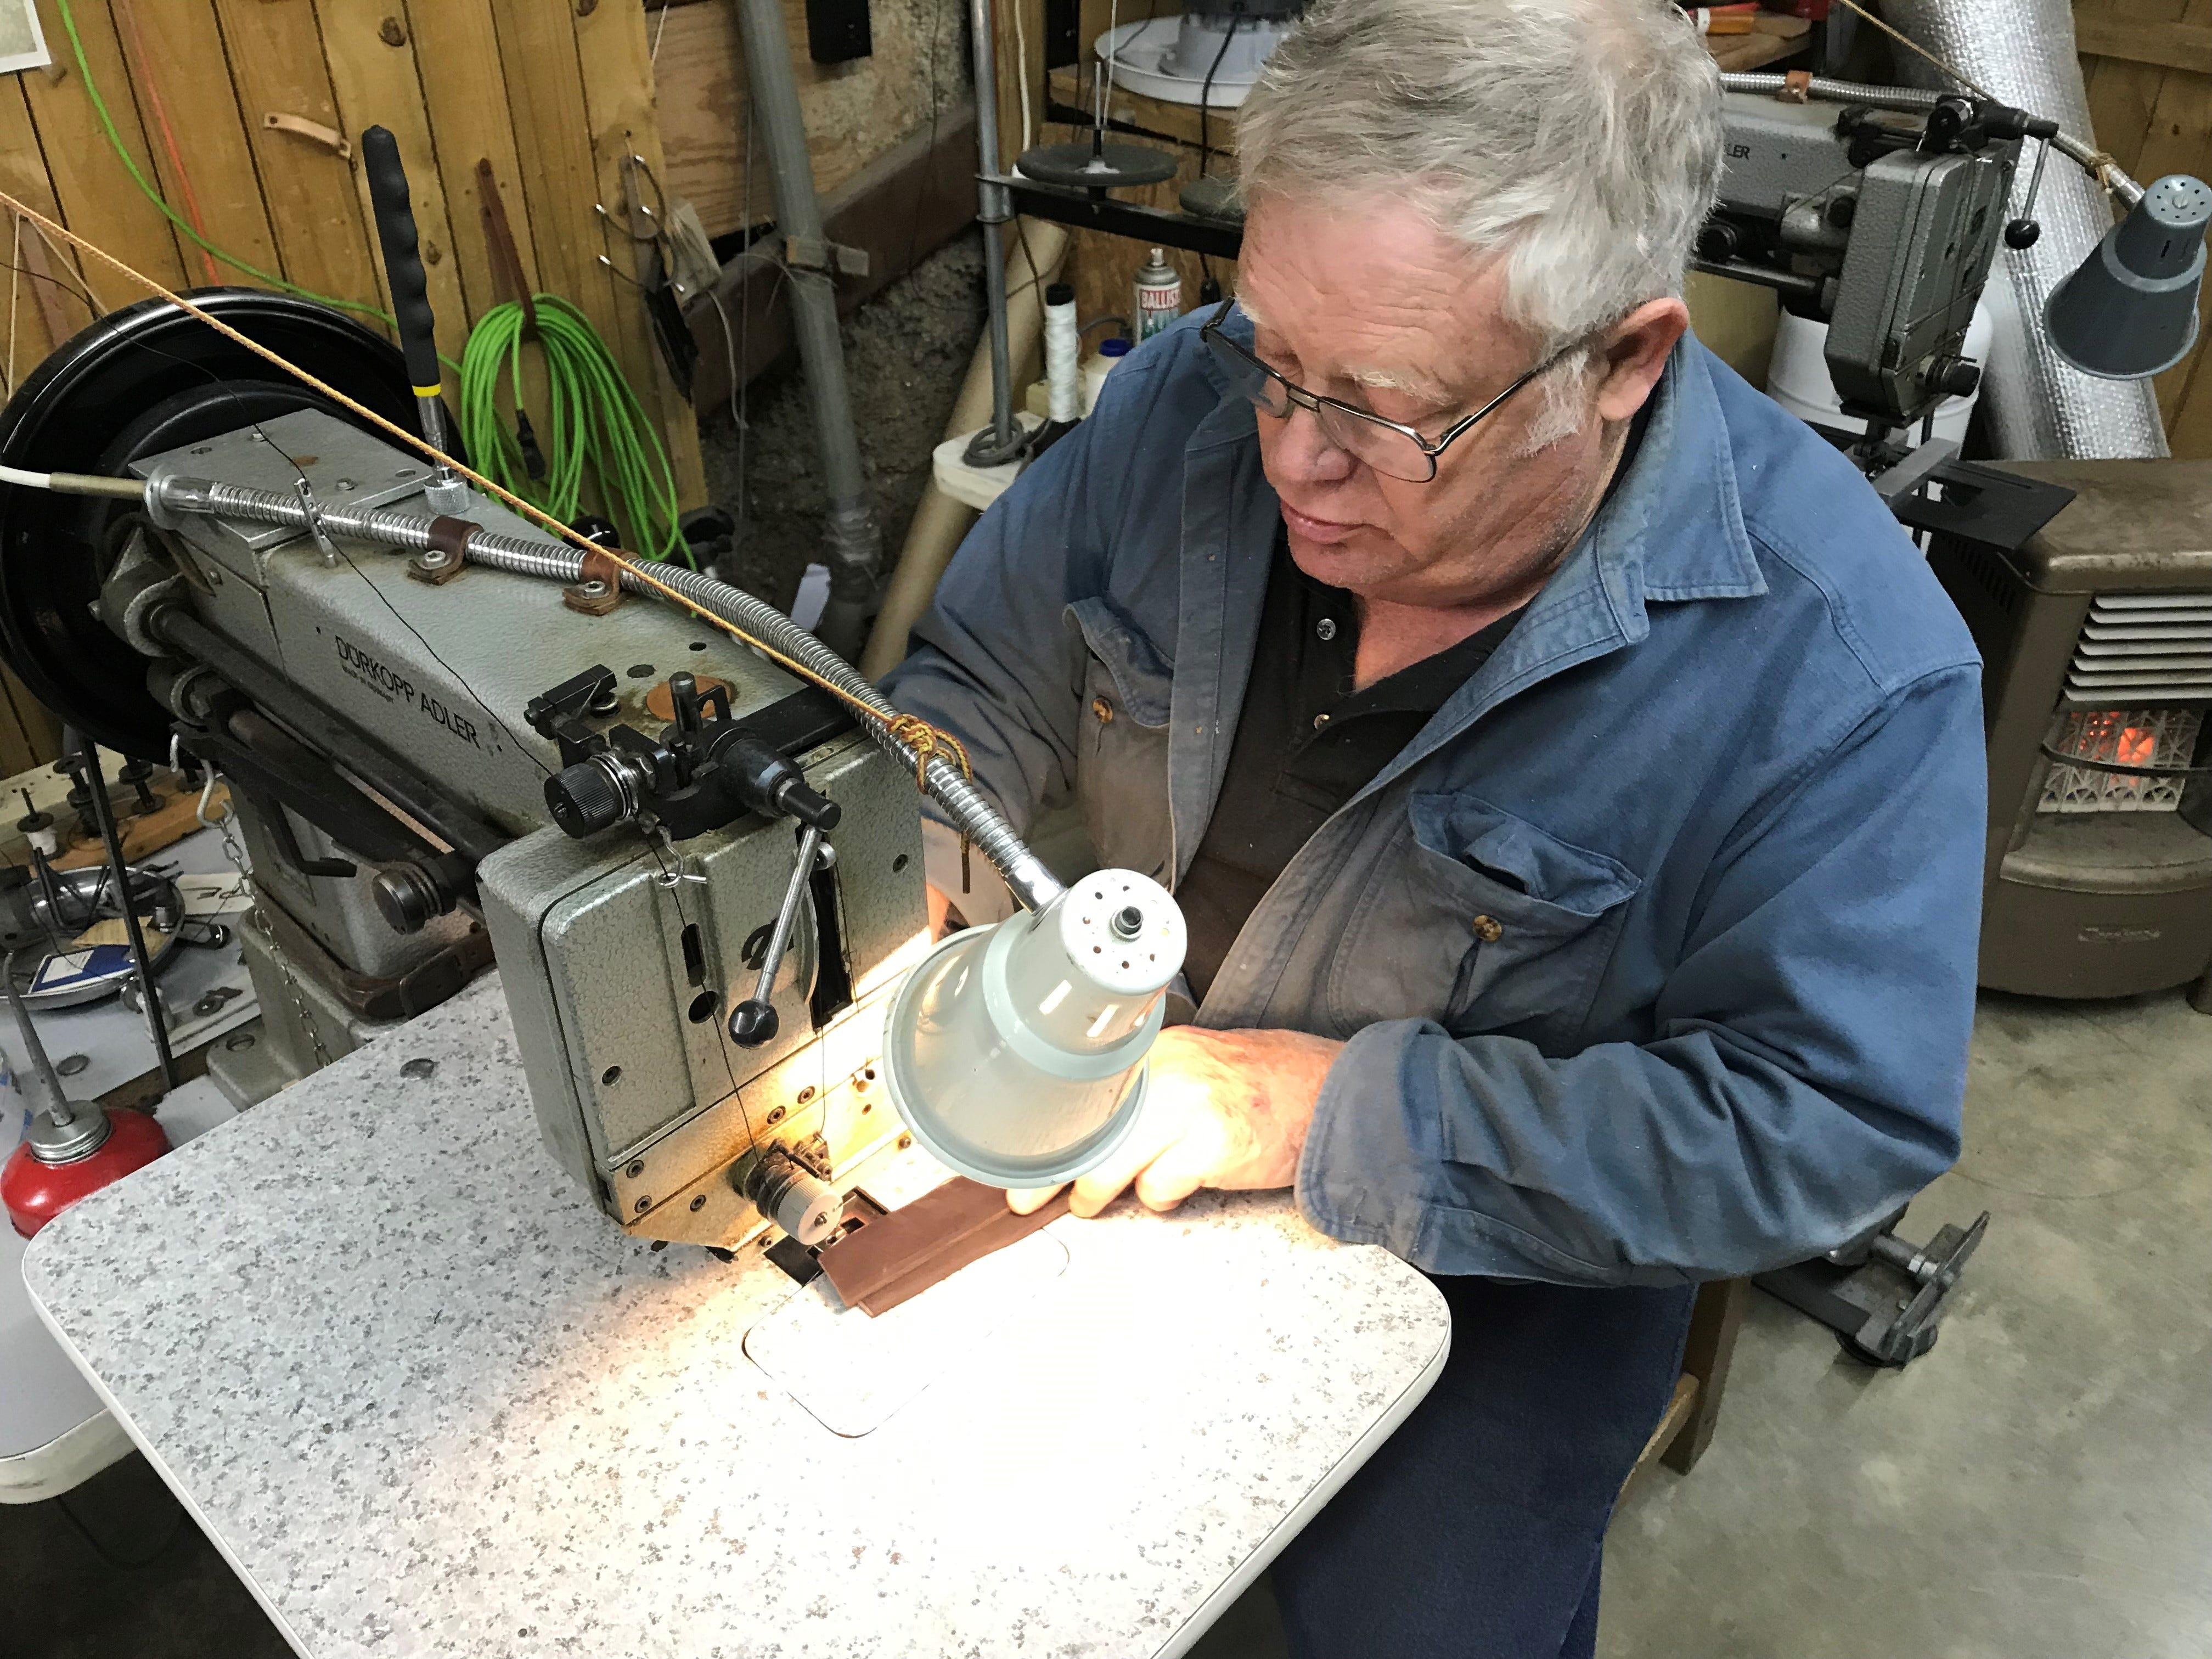 Nils Shawn Pascuzzi sews leather at Shawn's Custom Saddles and Tacks, 6581 Sykes Circle. Photo taken Jan. 2, 2019.